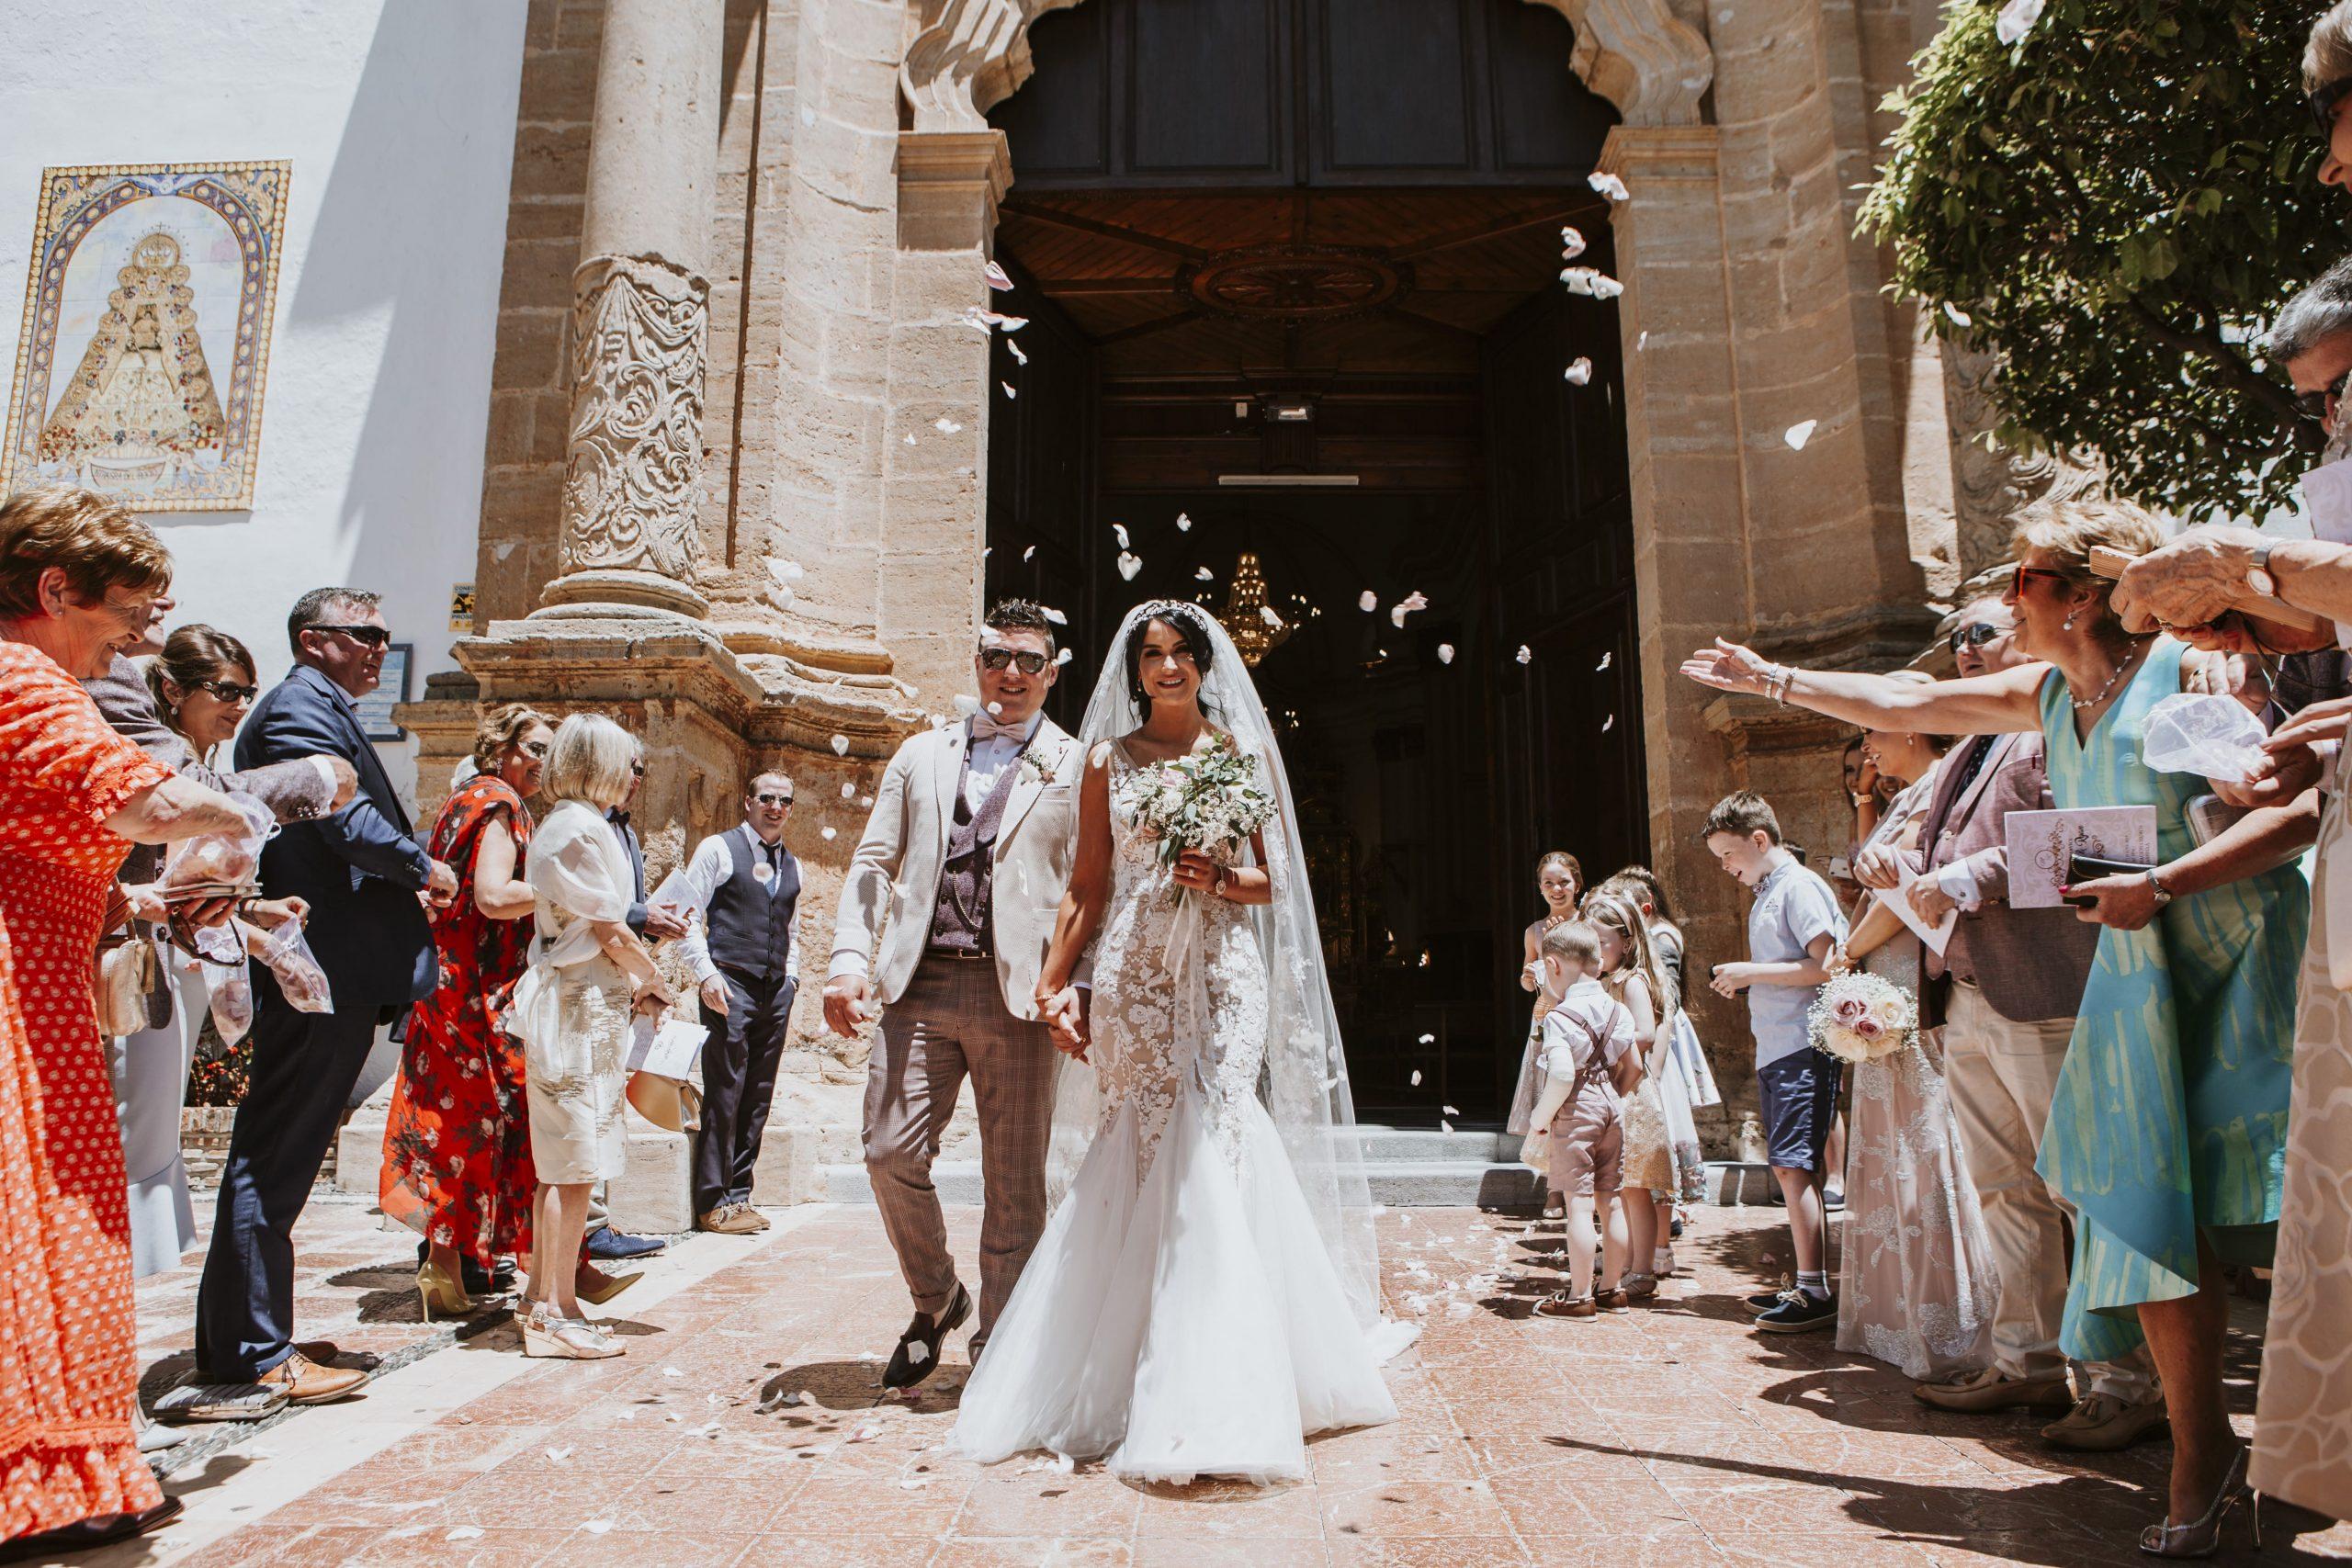 Steps When Choosing Your Wedding Venue